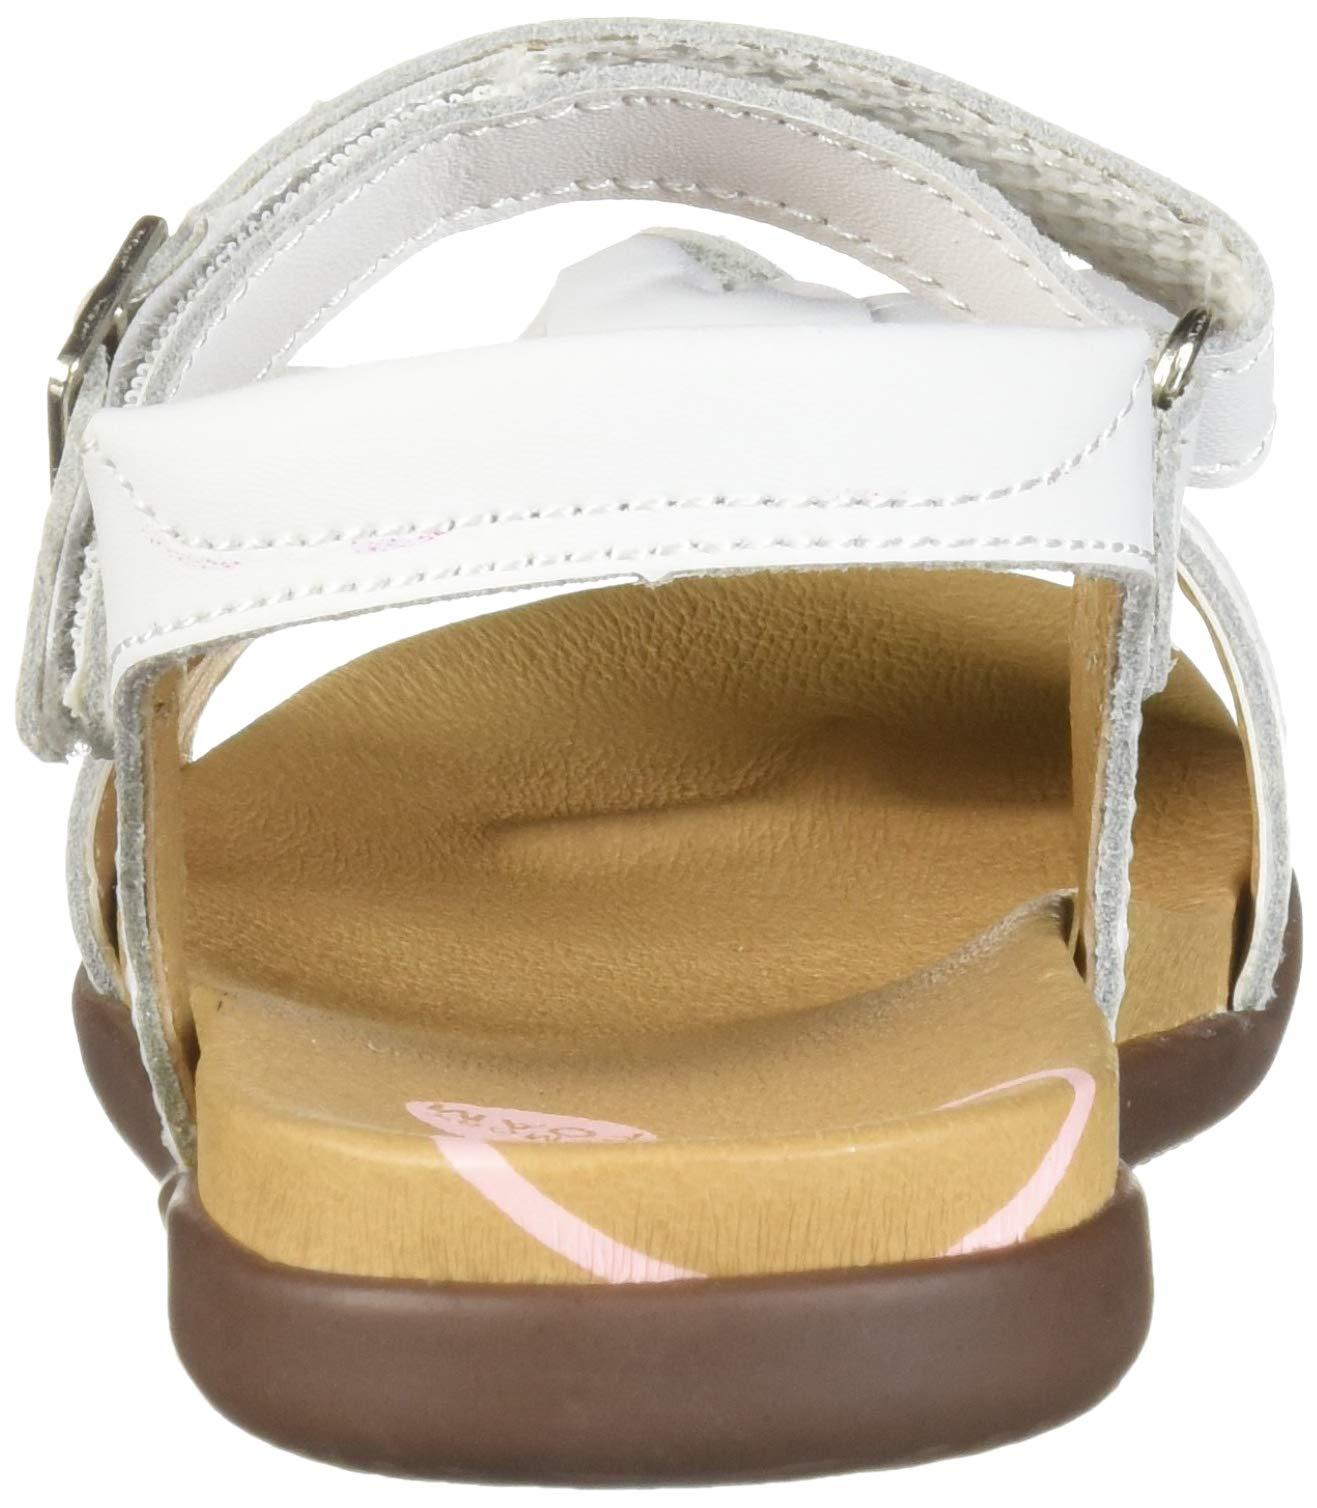 Stride Rite SRTech Savannah Girl's Sandal, White, 9 M US Toddler by Stride Rite (Image #2)